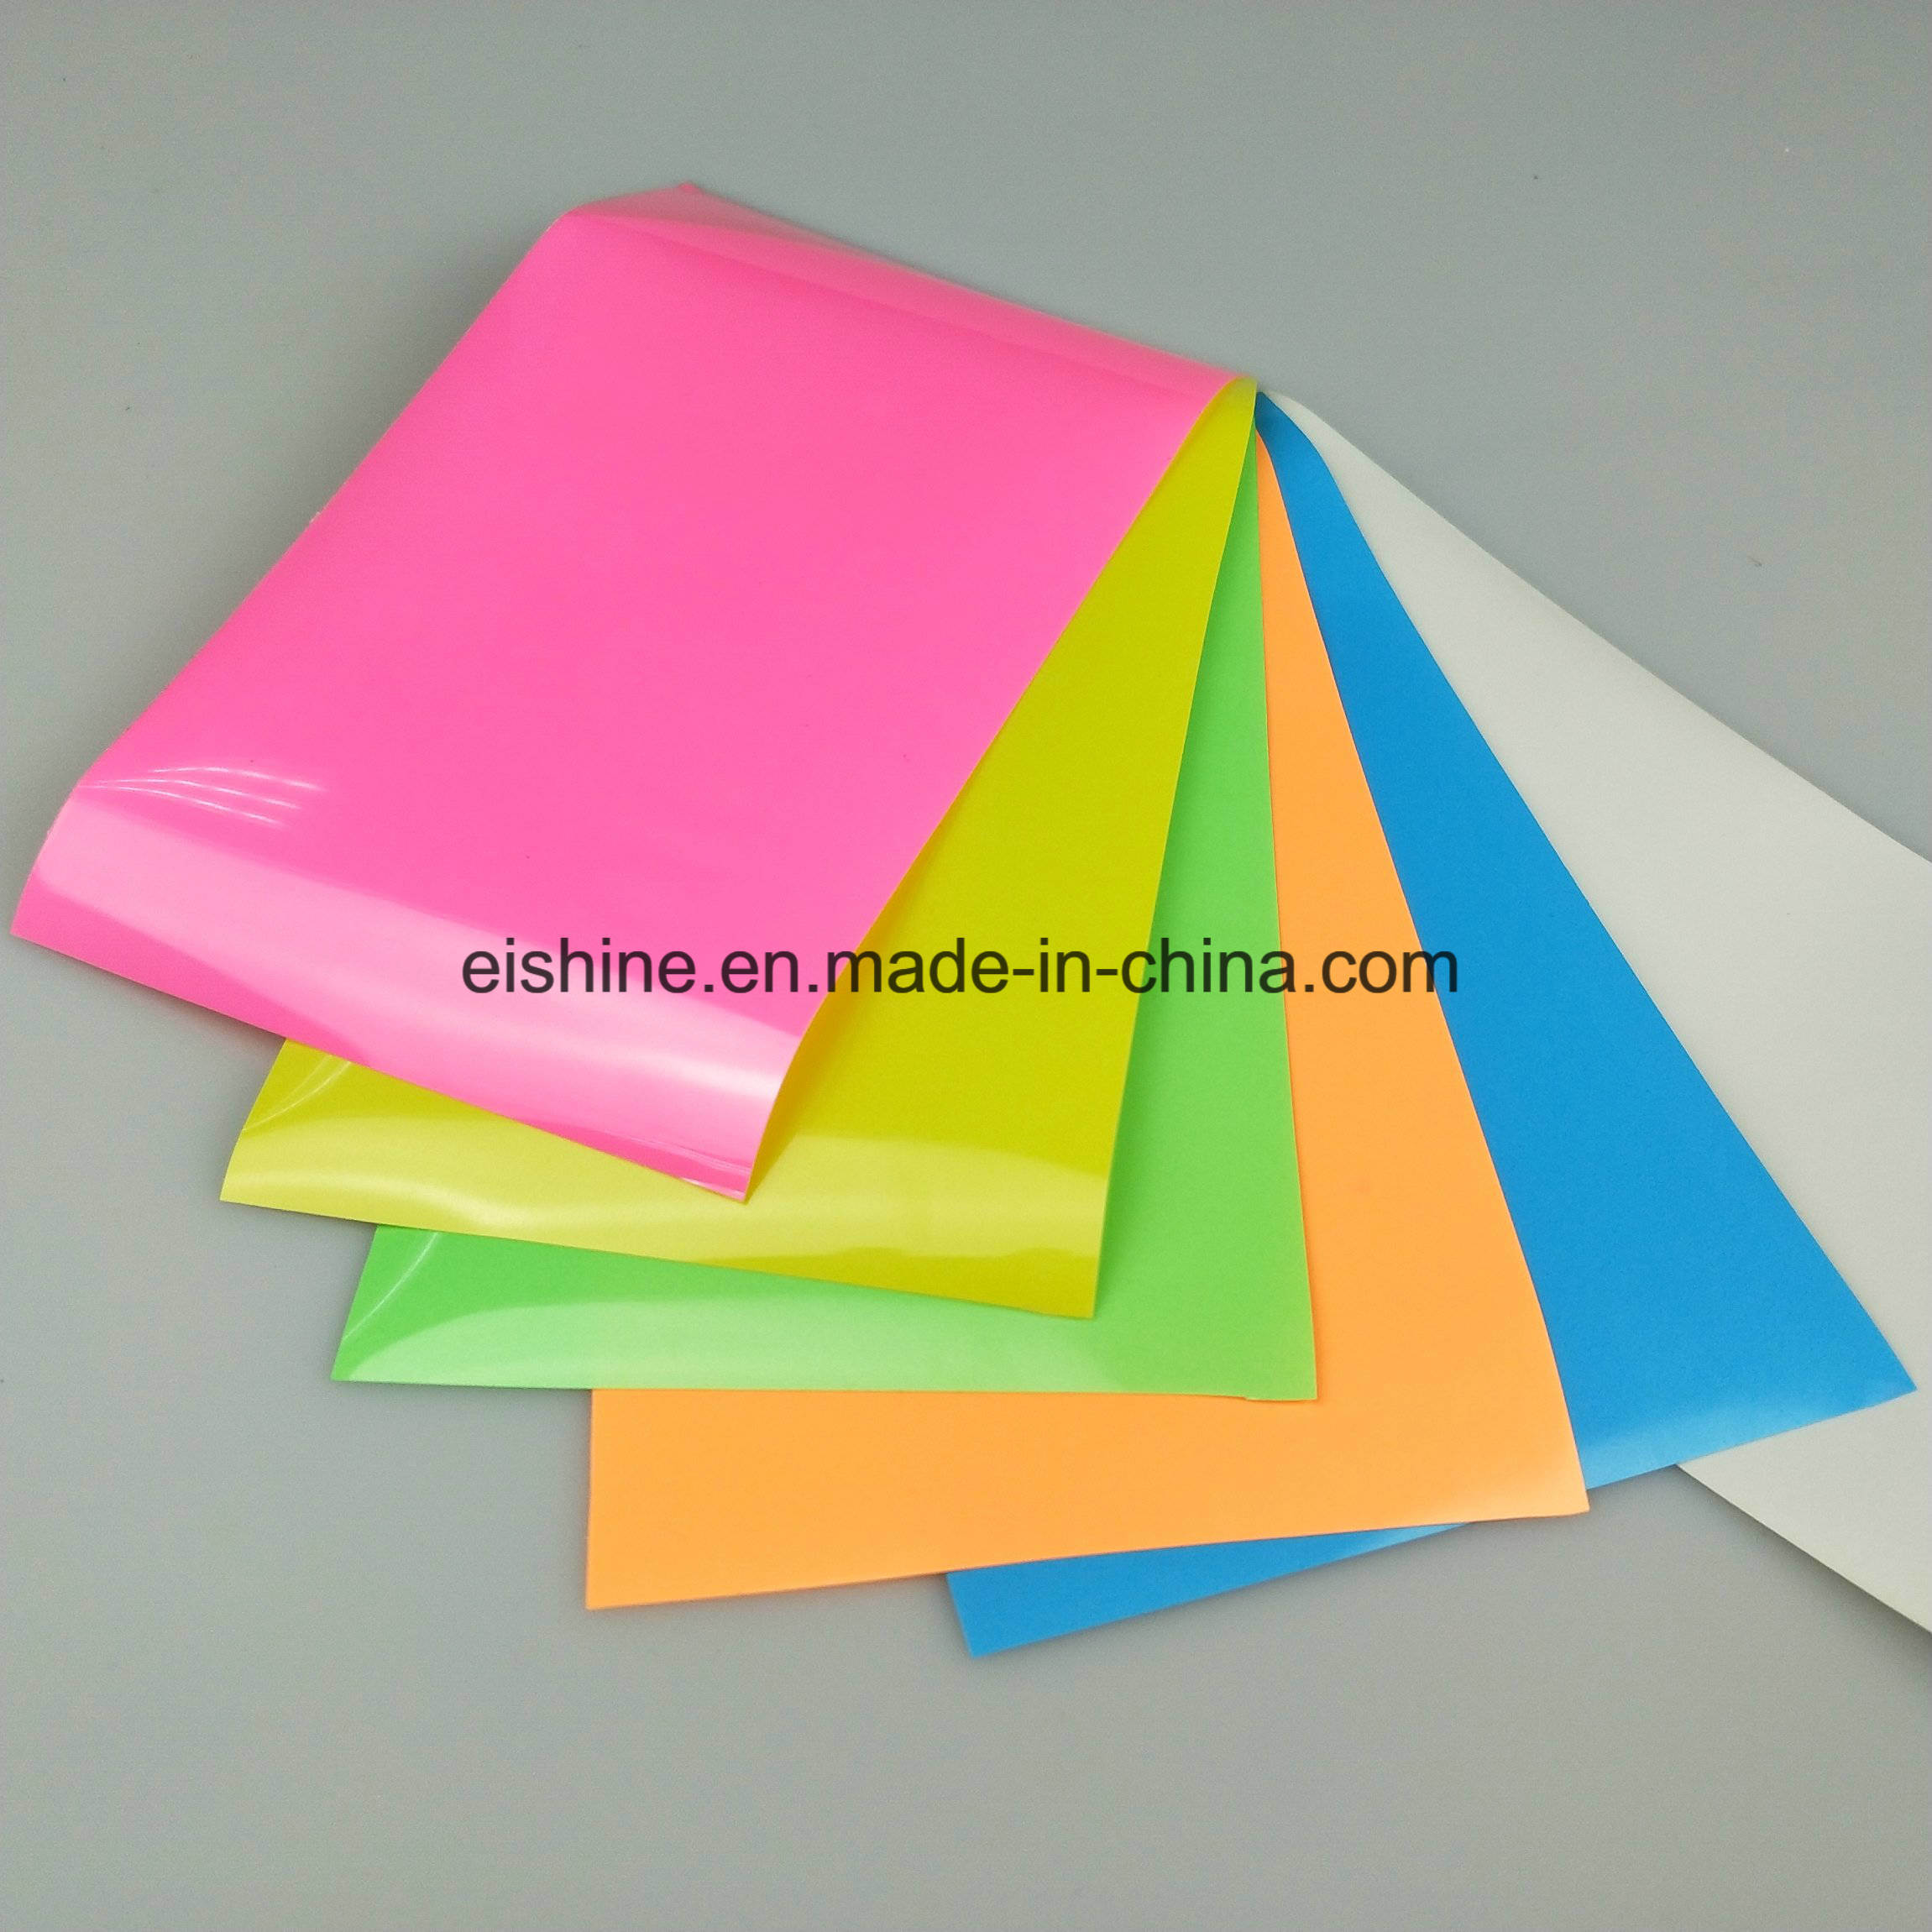 China E Shine Blue Color 50cm 25m Glow In The Dark Vinyl Tape Heat